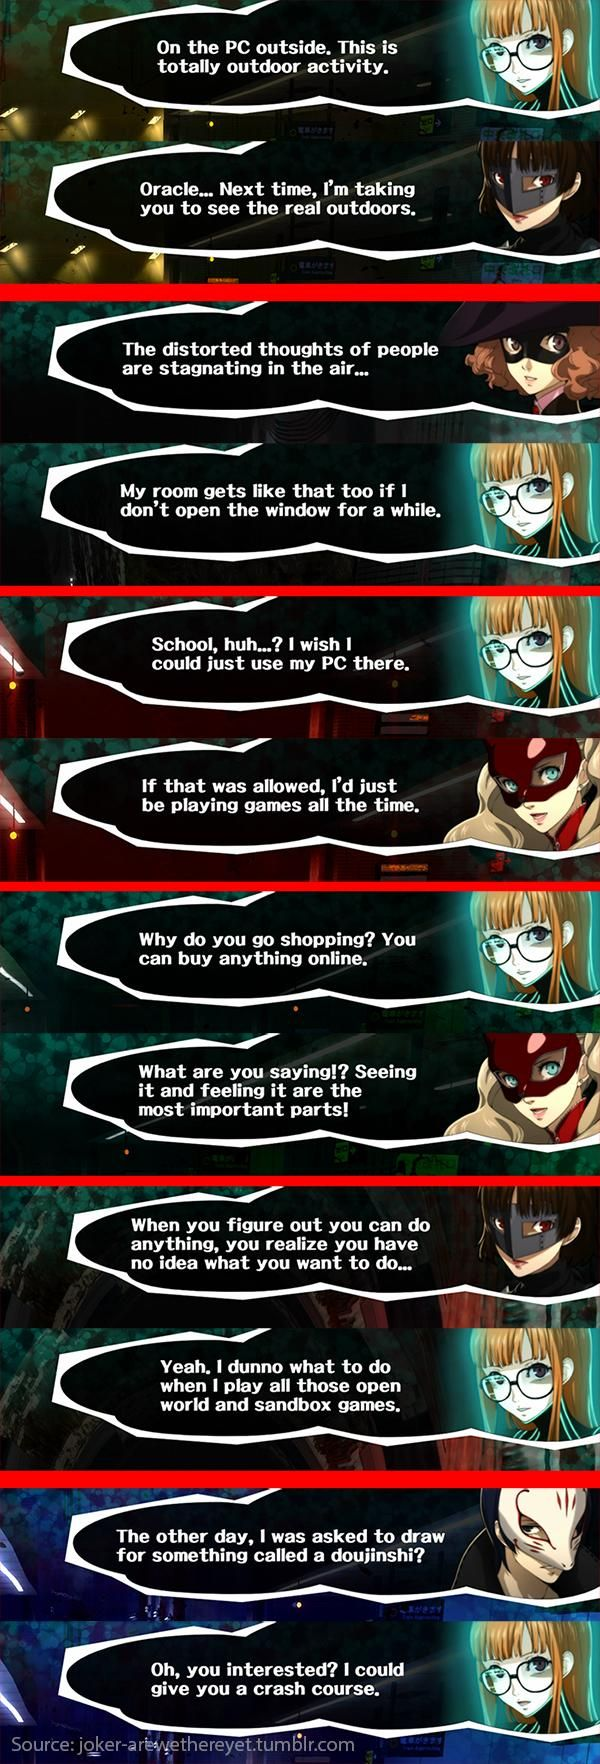 [Persona 5] Futaba Sakura: r/gaming as a JRPG character